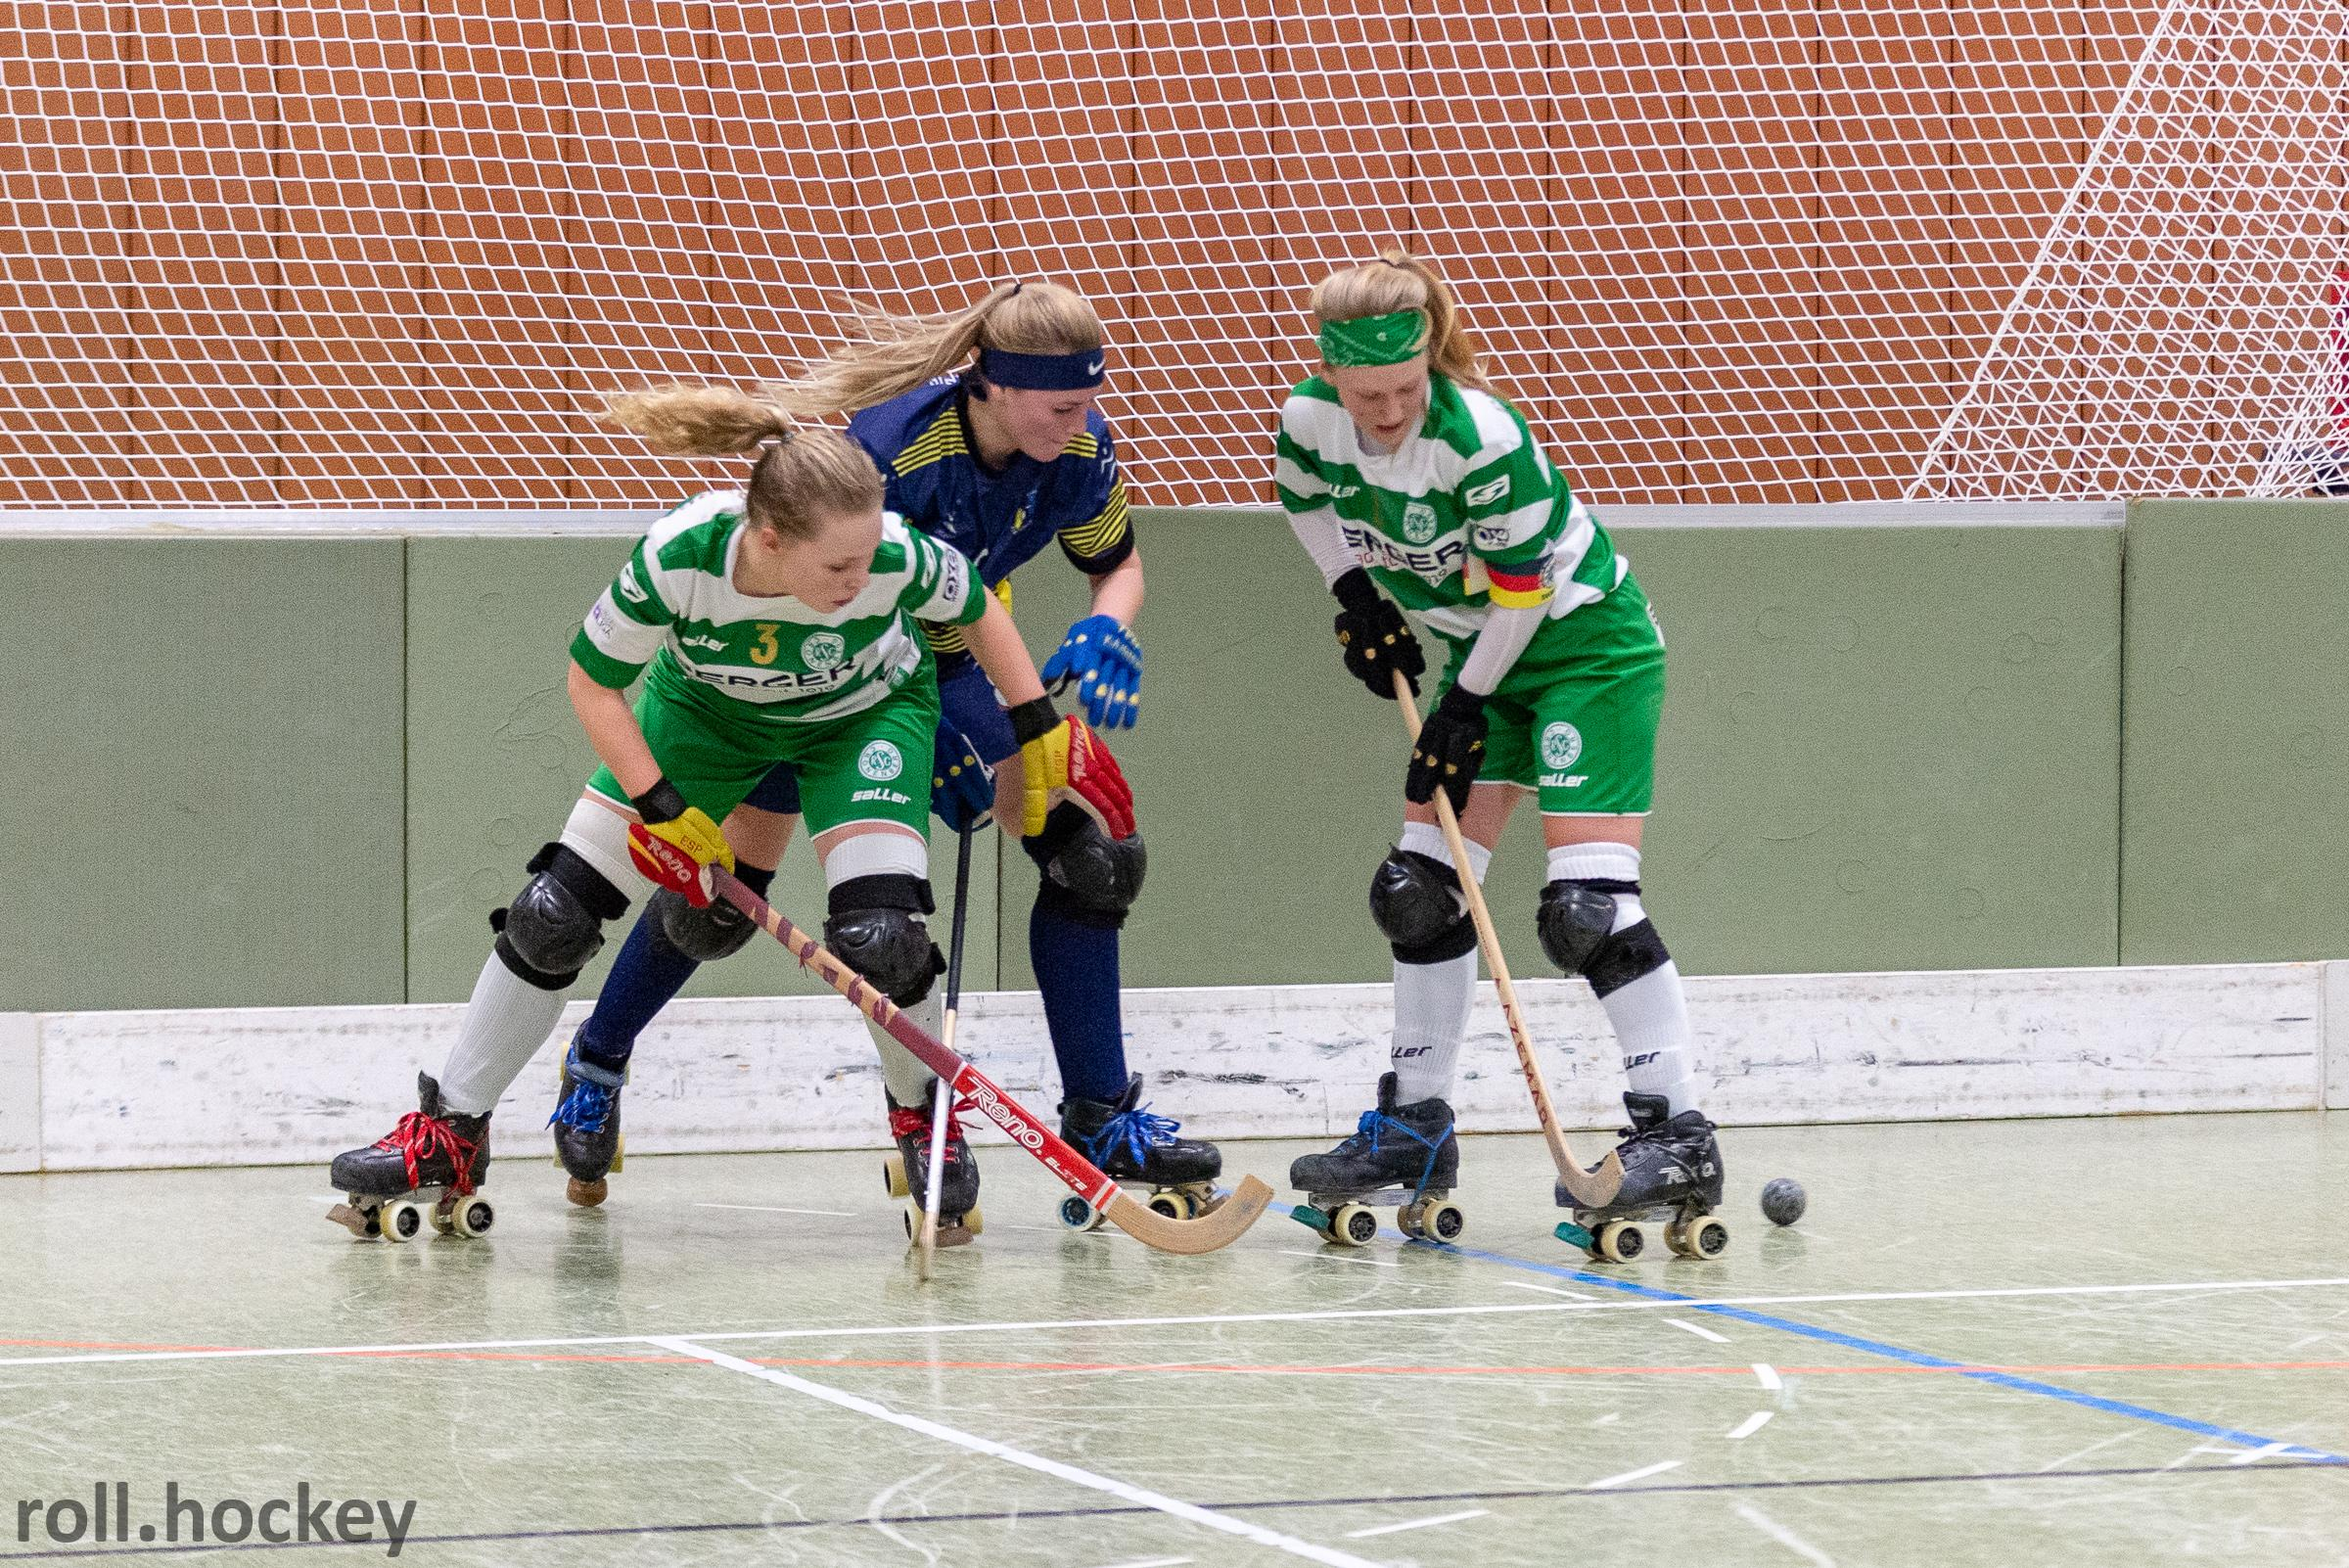 RSC Cronenberg Rollhockey Bundesliga Damen Spieltag 05.01.2019